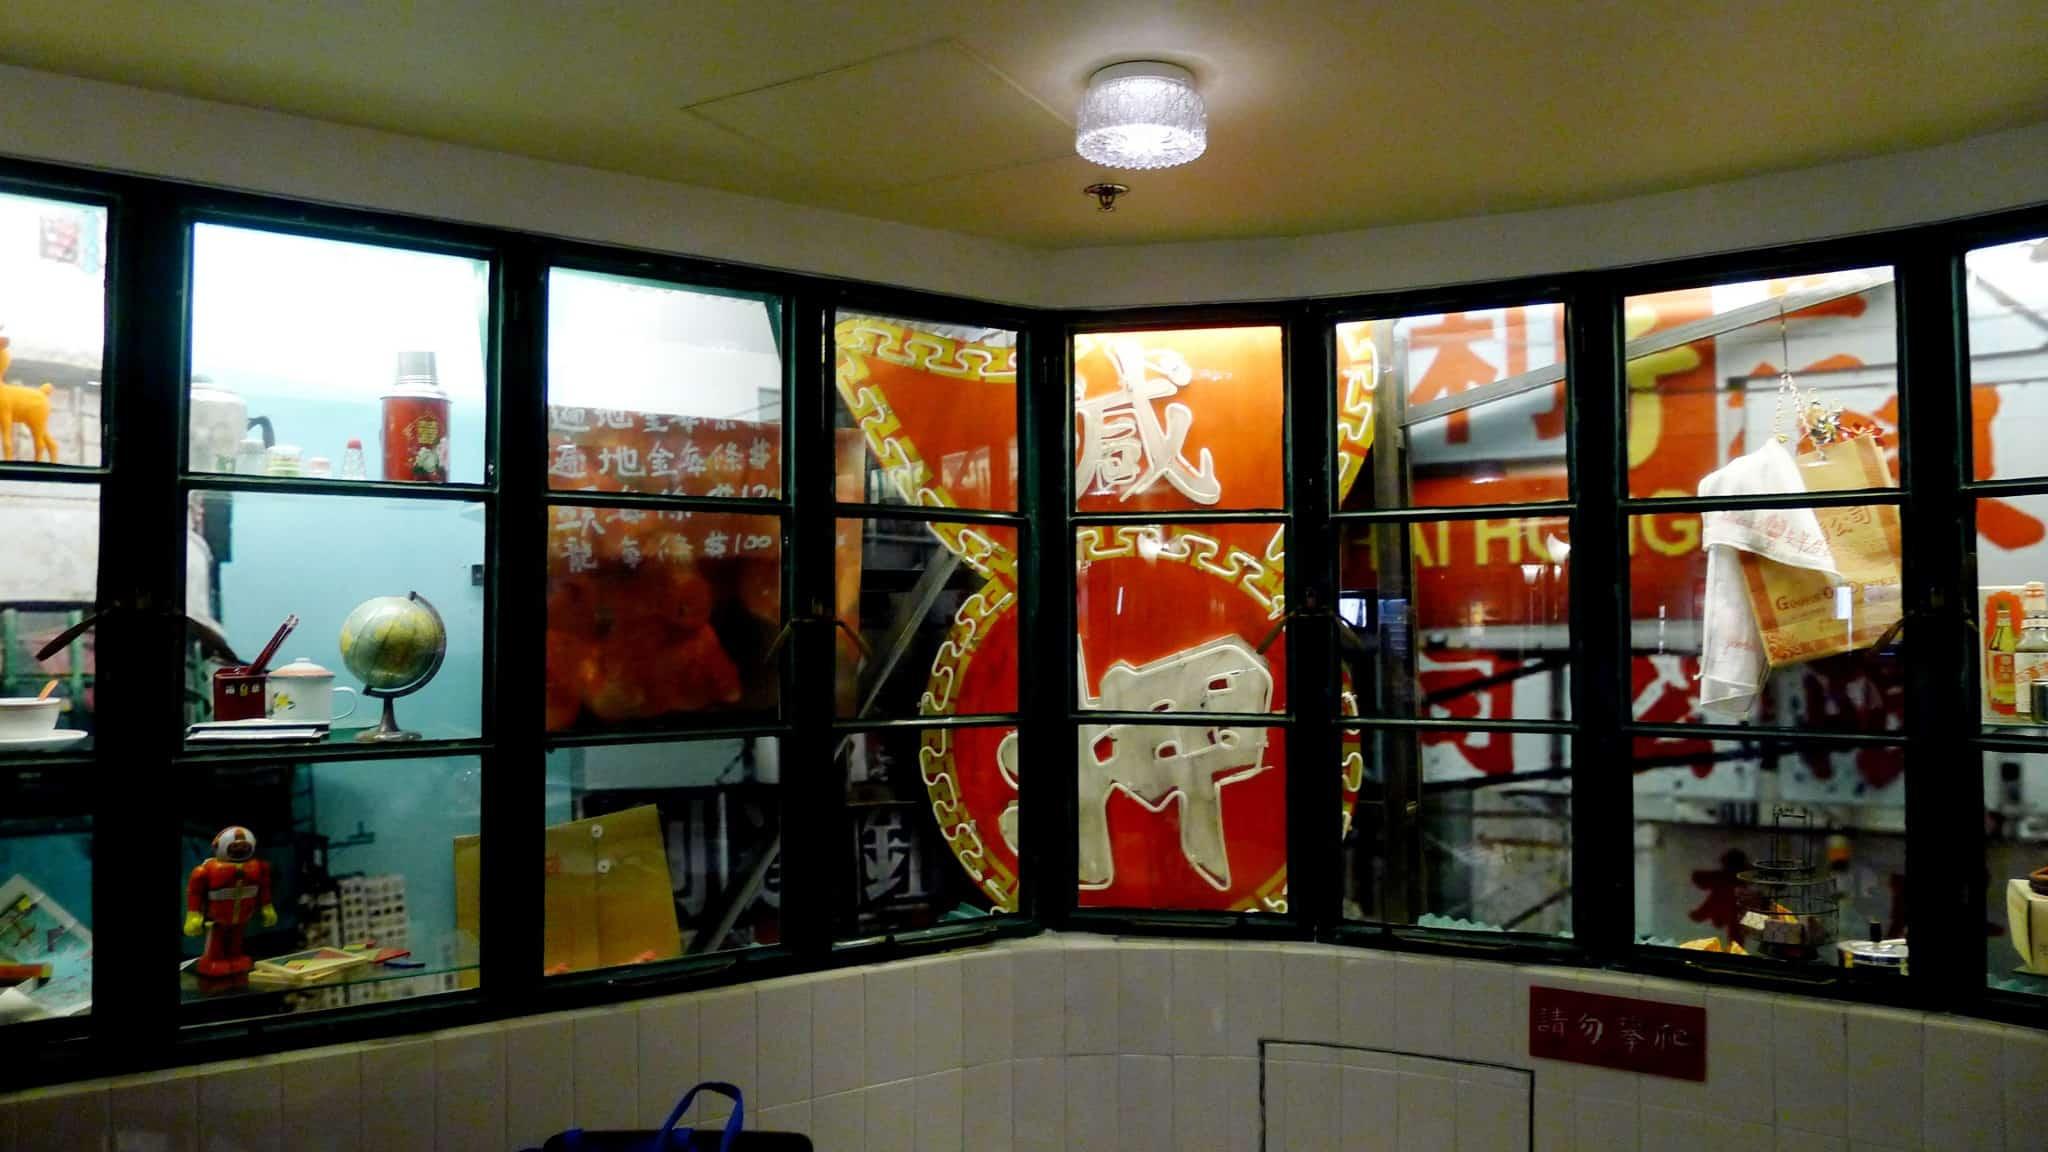 Retro Starbucks Coffee Hong Kong Central Duddell Street | Vintage Bing Sutt 星巴克 冰室